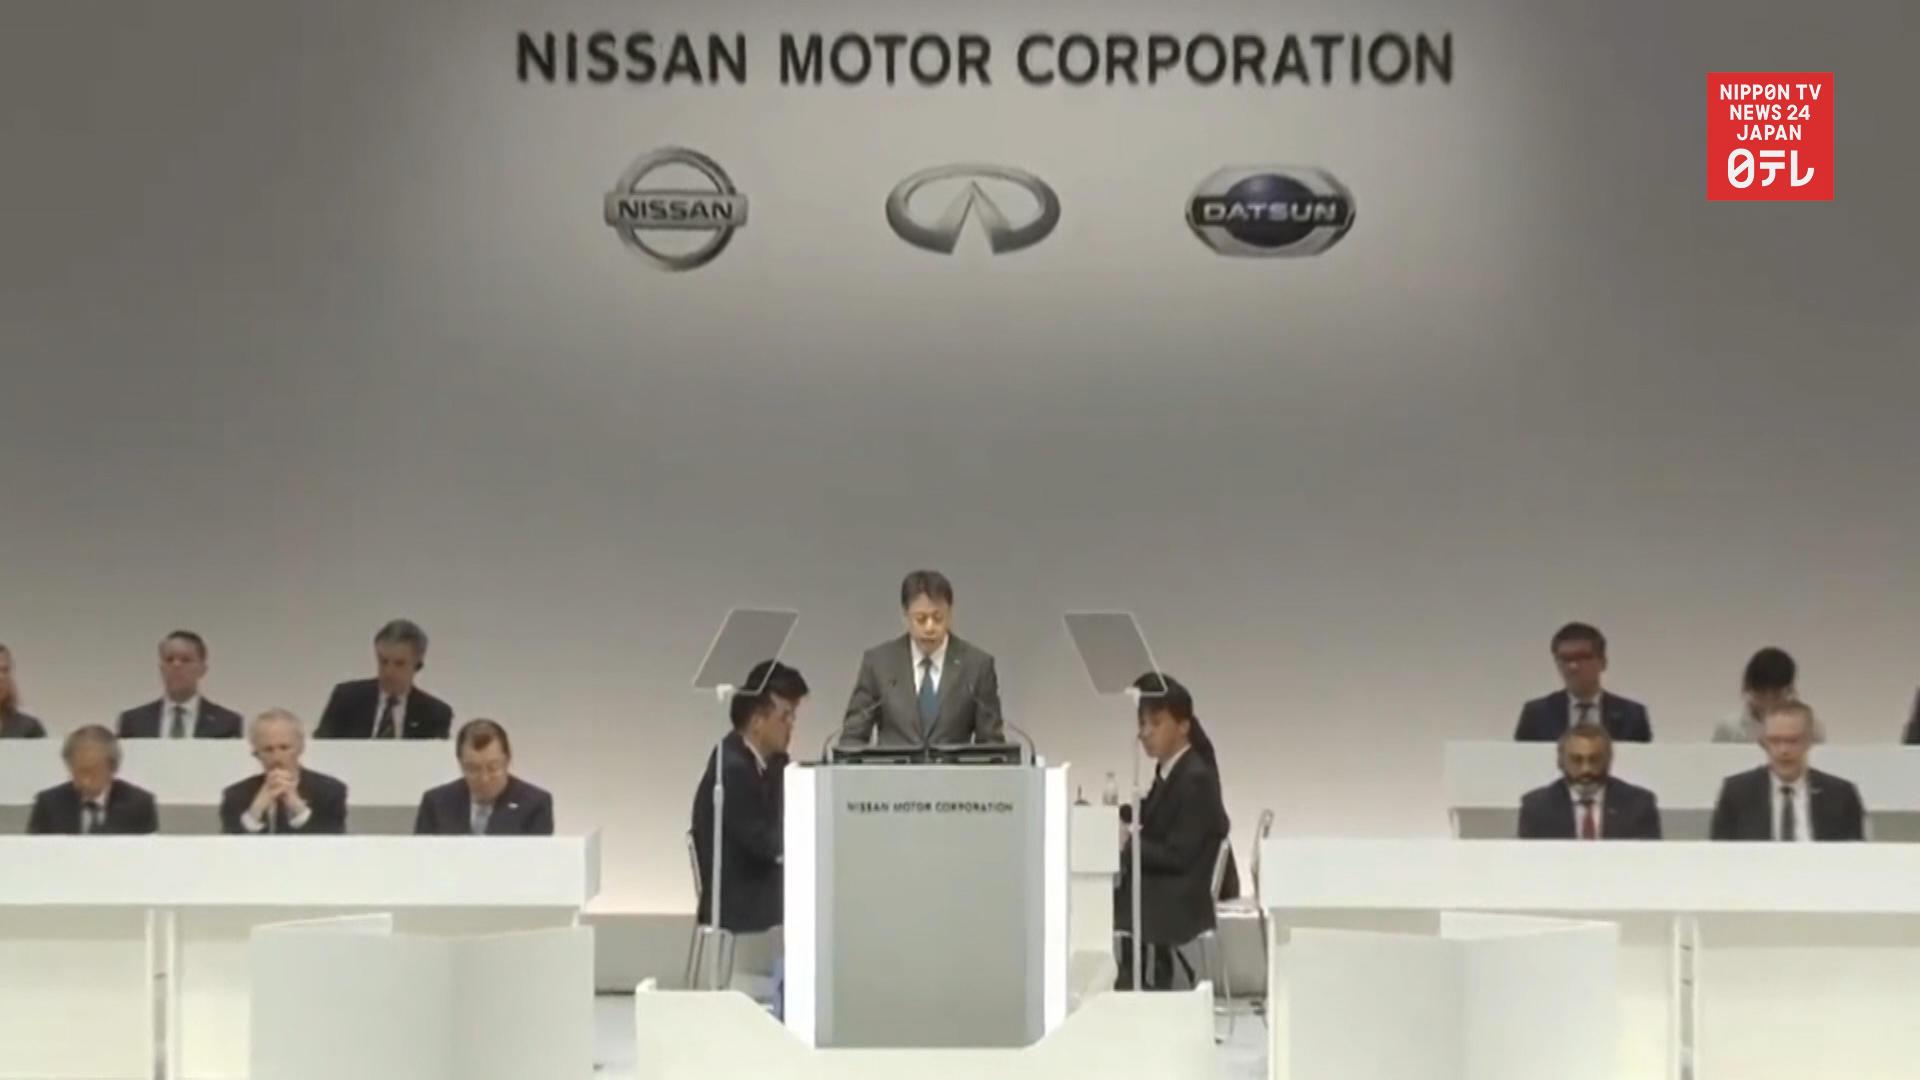 New CEO ready to turn around Nissan